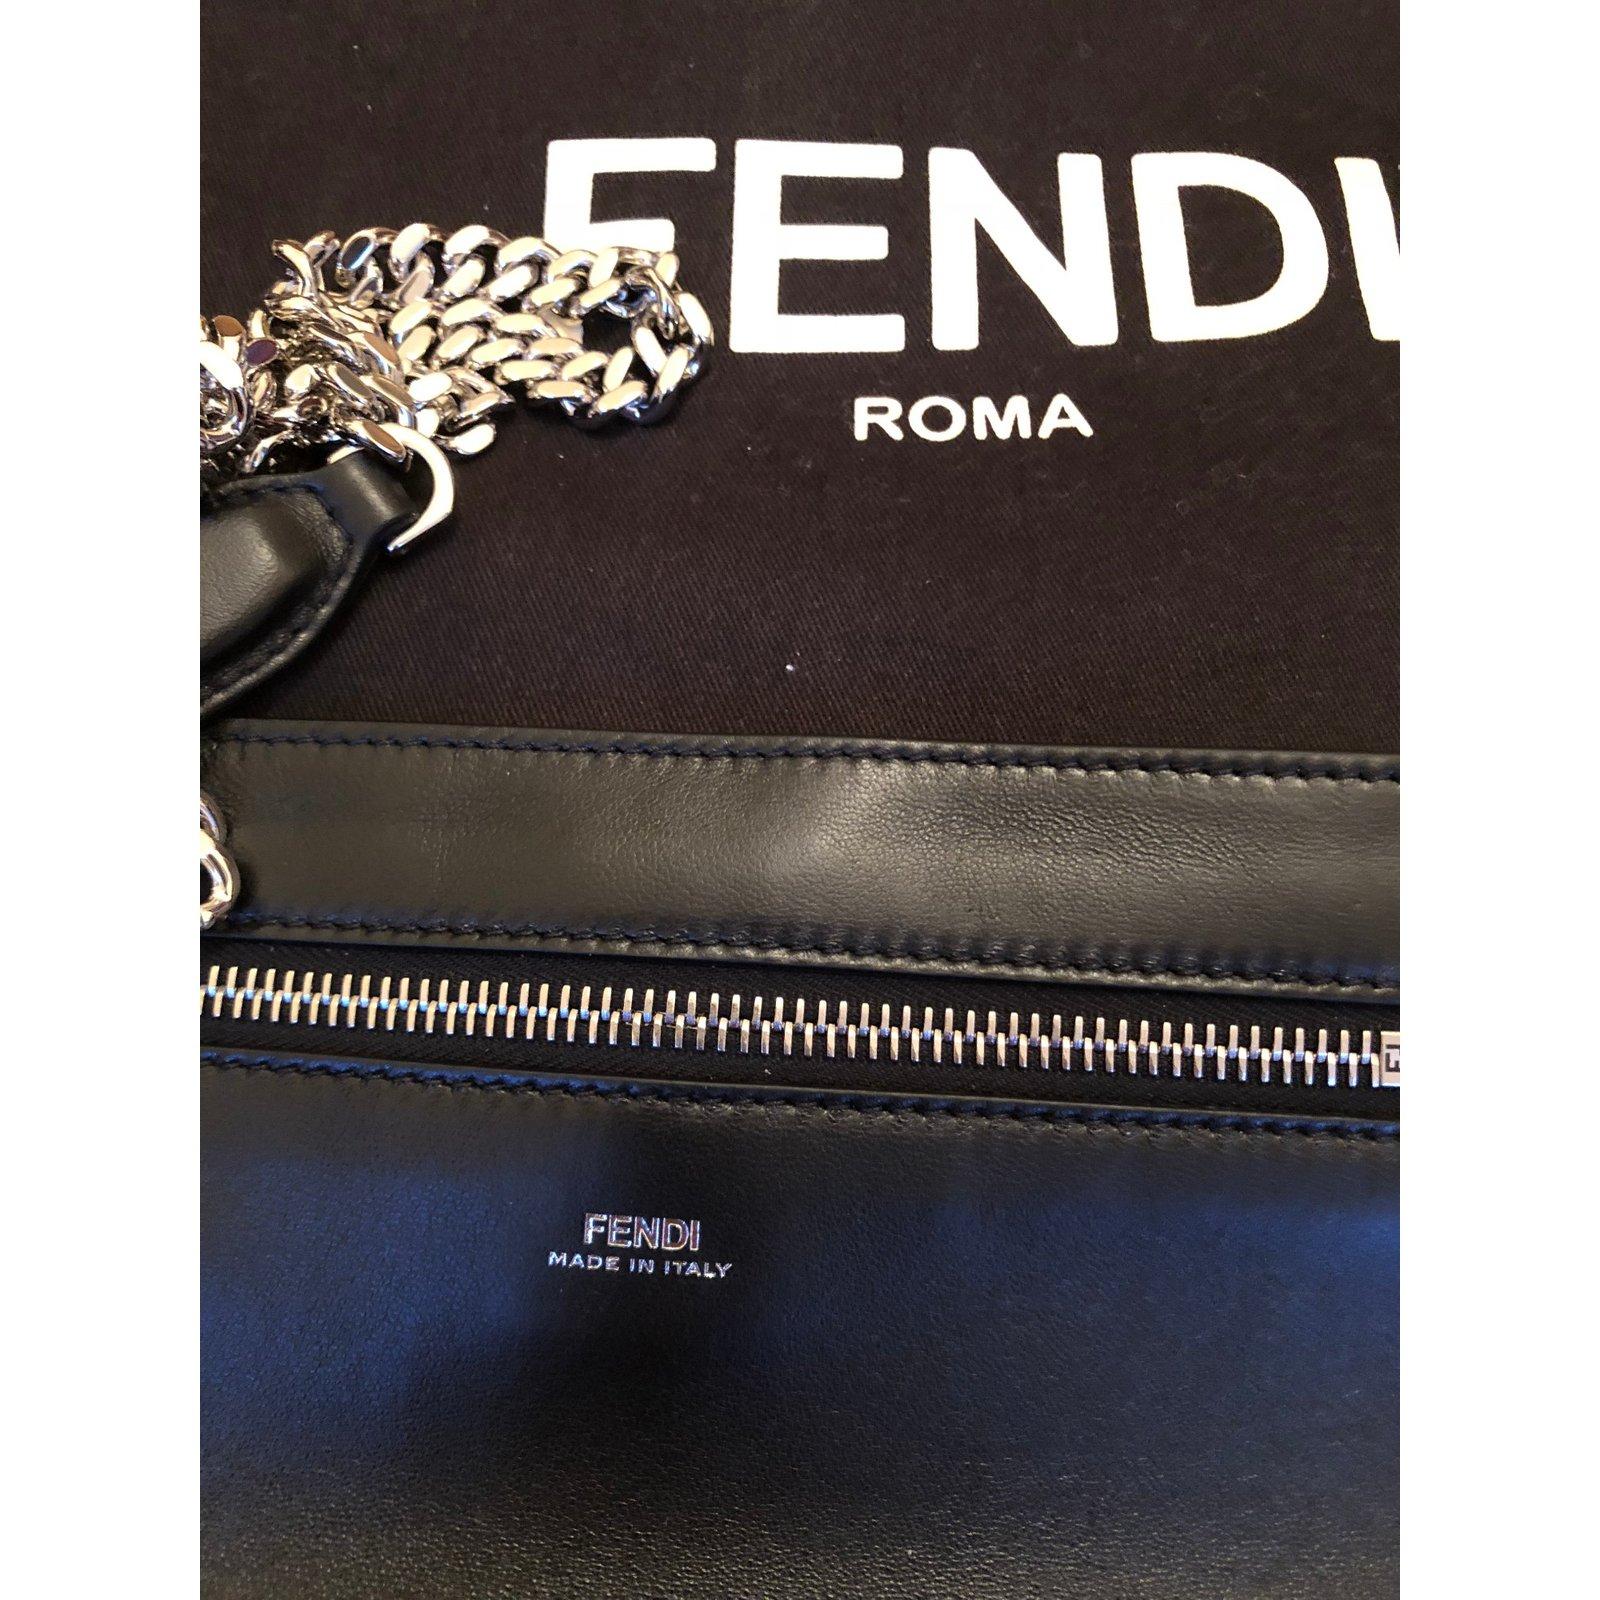 826d00c1bc44 ... canada fendi fendi black matelasse leather dotcom click bag in new  condition handbags leather black ref ...